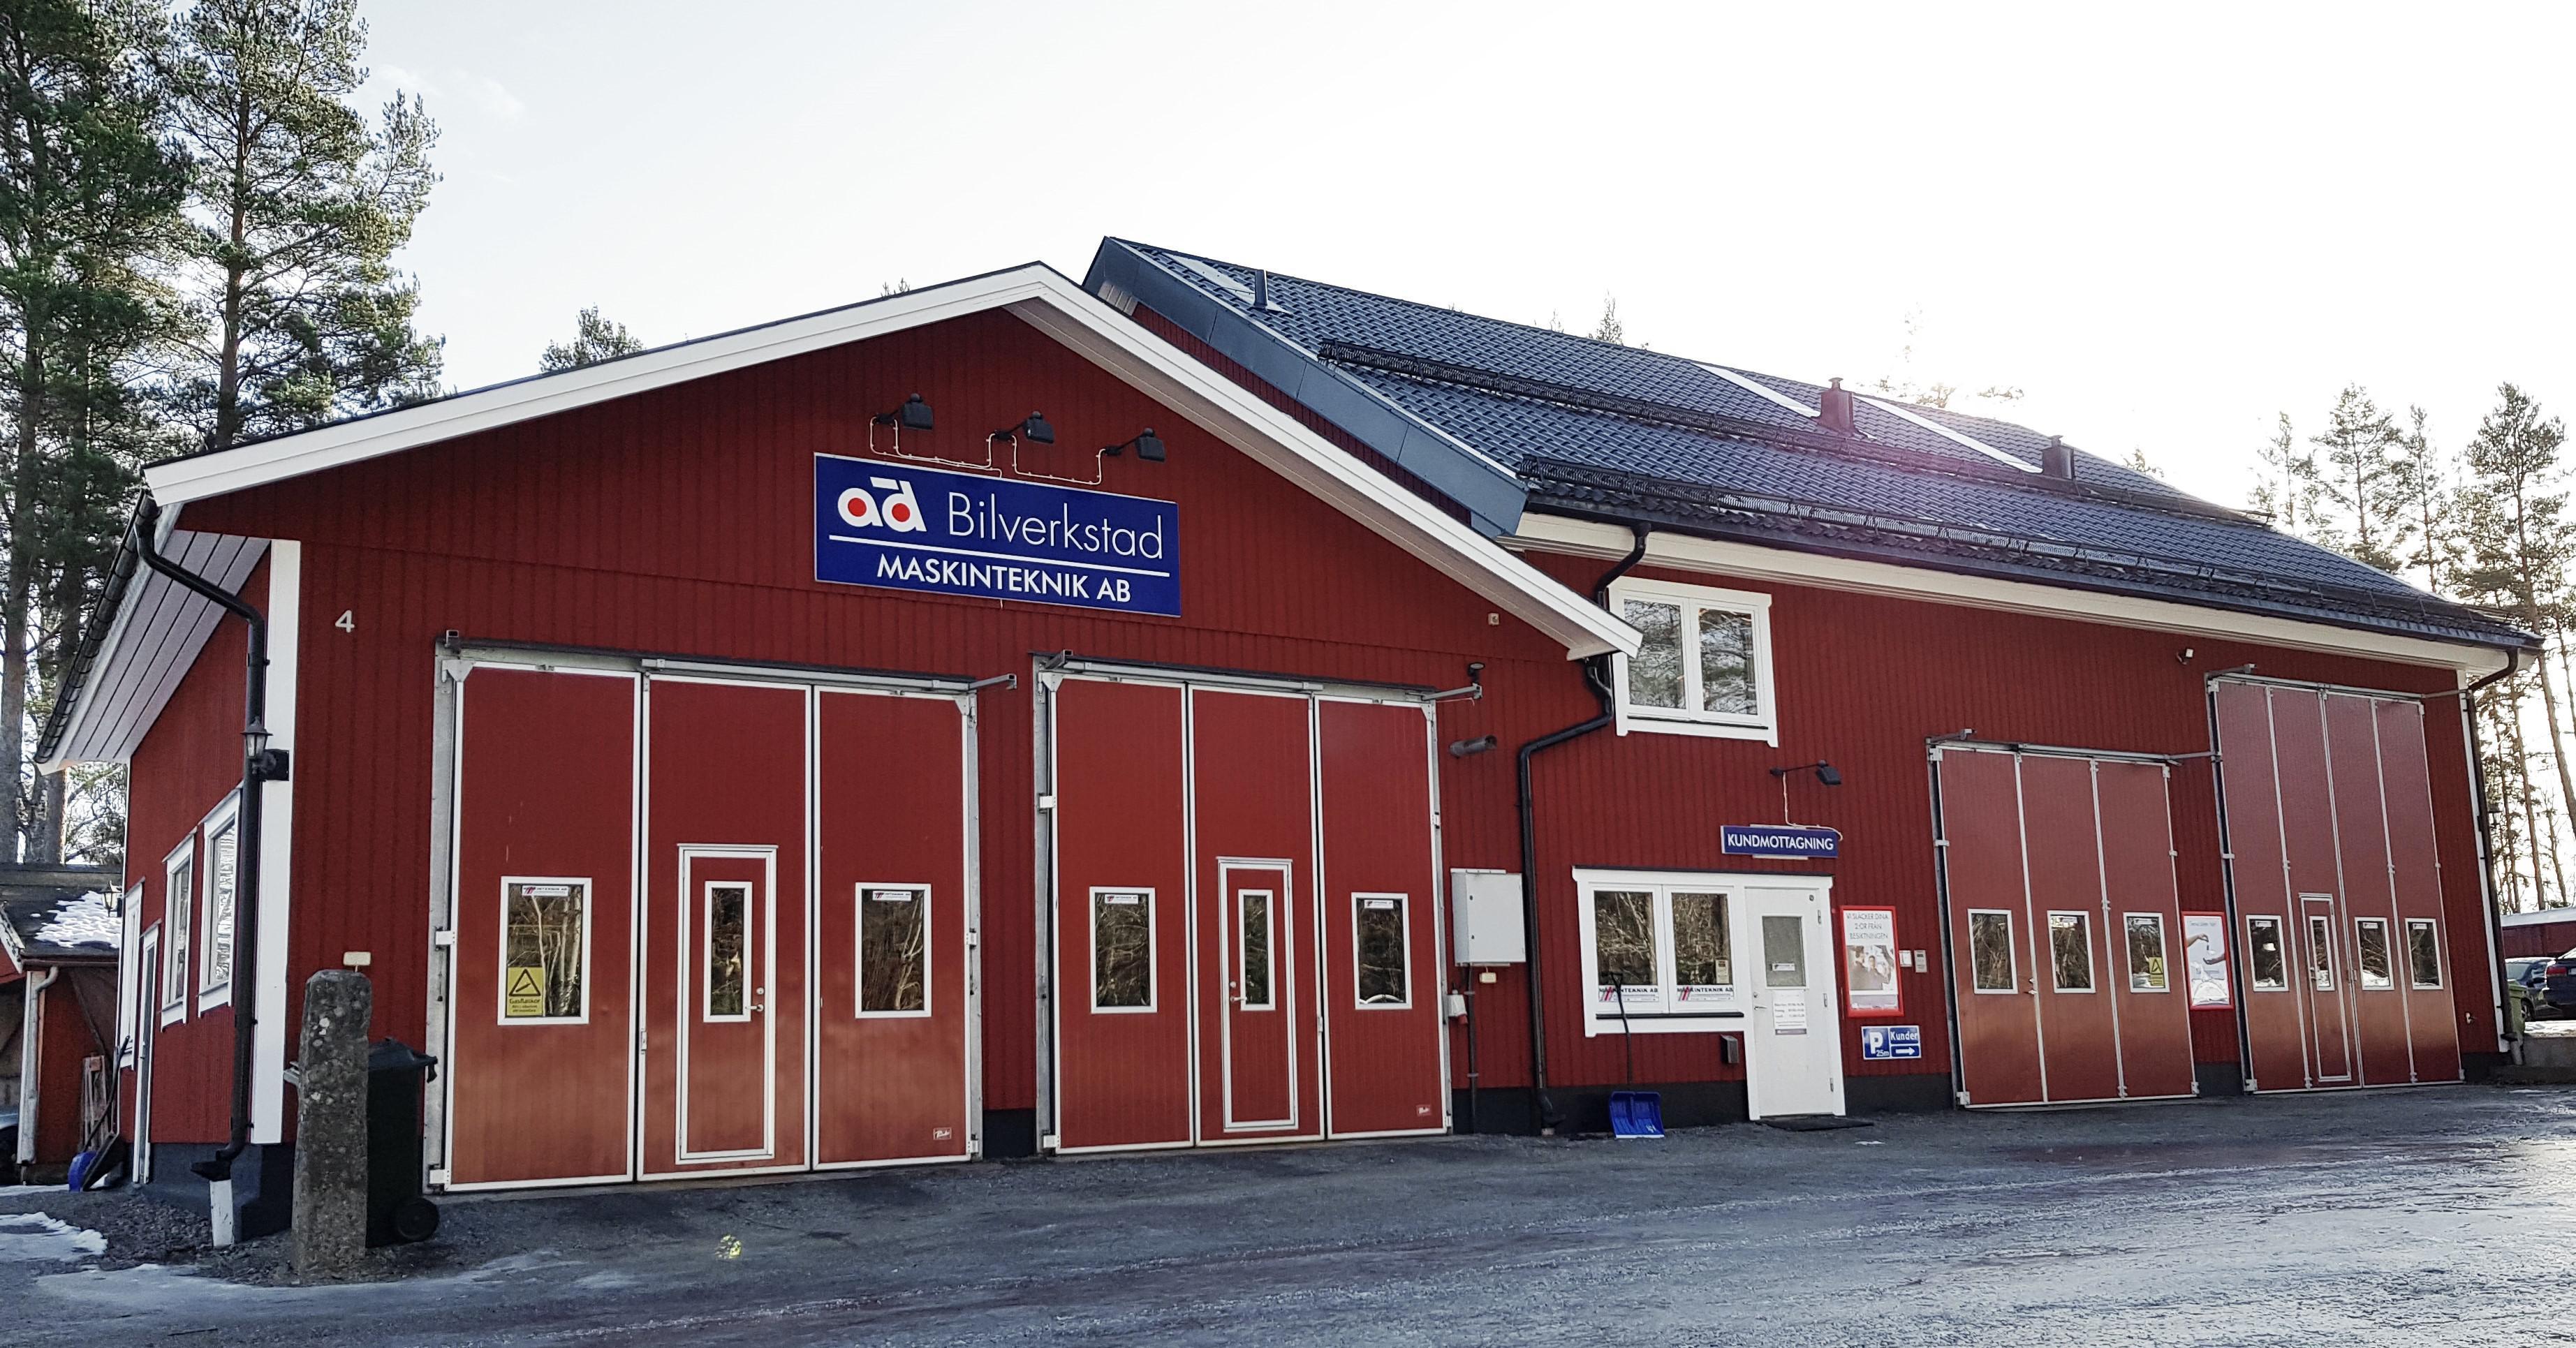 AD Bilverkstad - Maskinteknik AB - Rådmansö - Norrtälje